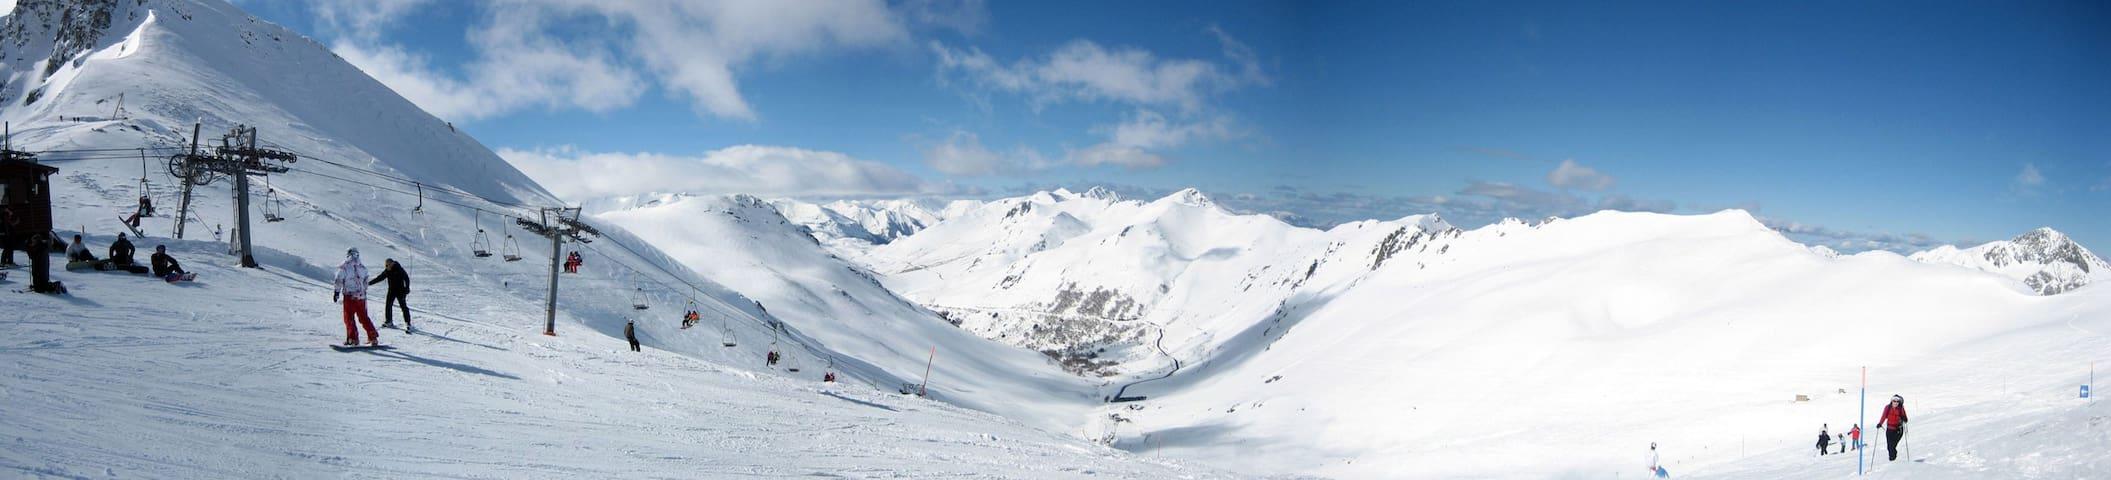 5 beds near ski resort - Cerulleda - Appartement